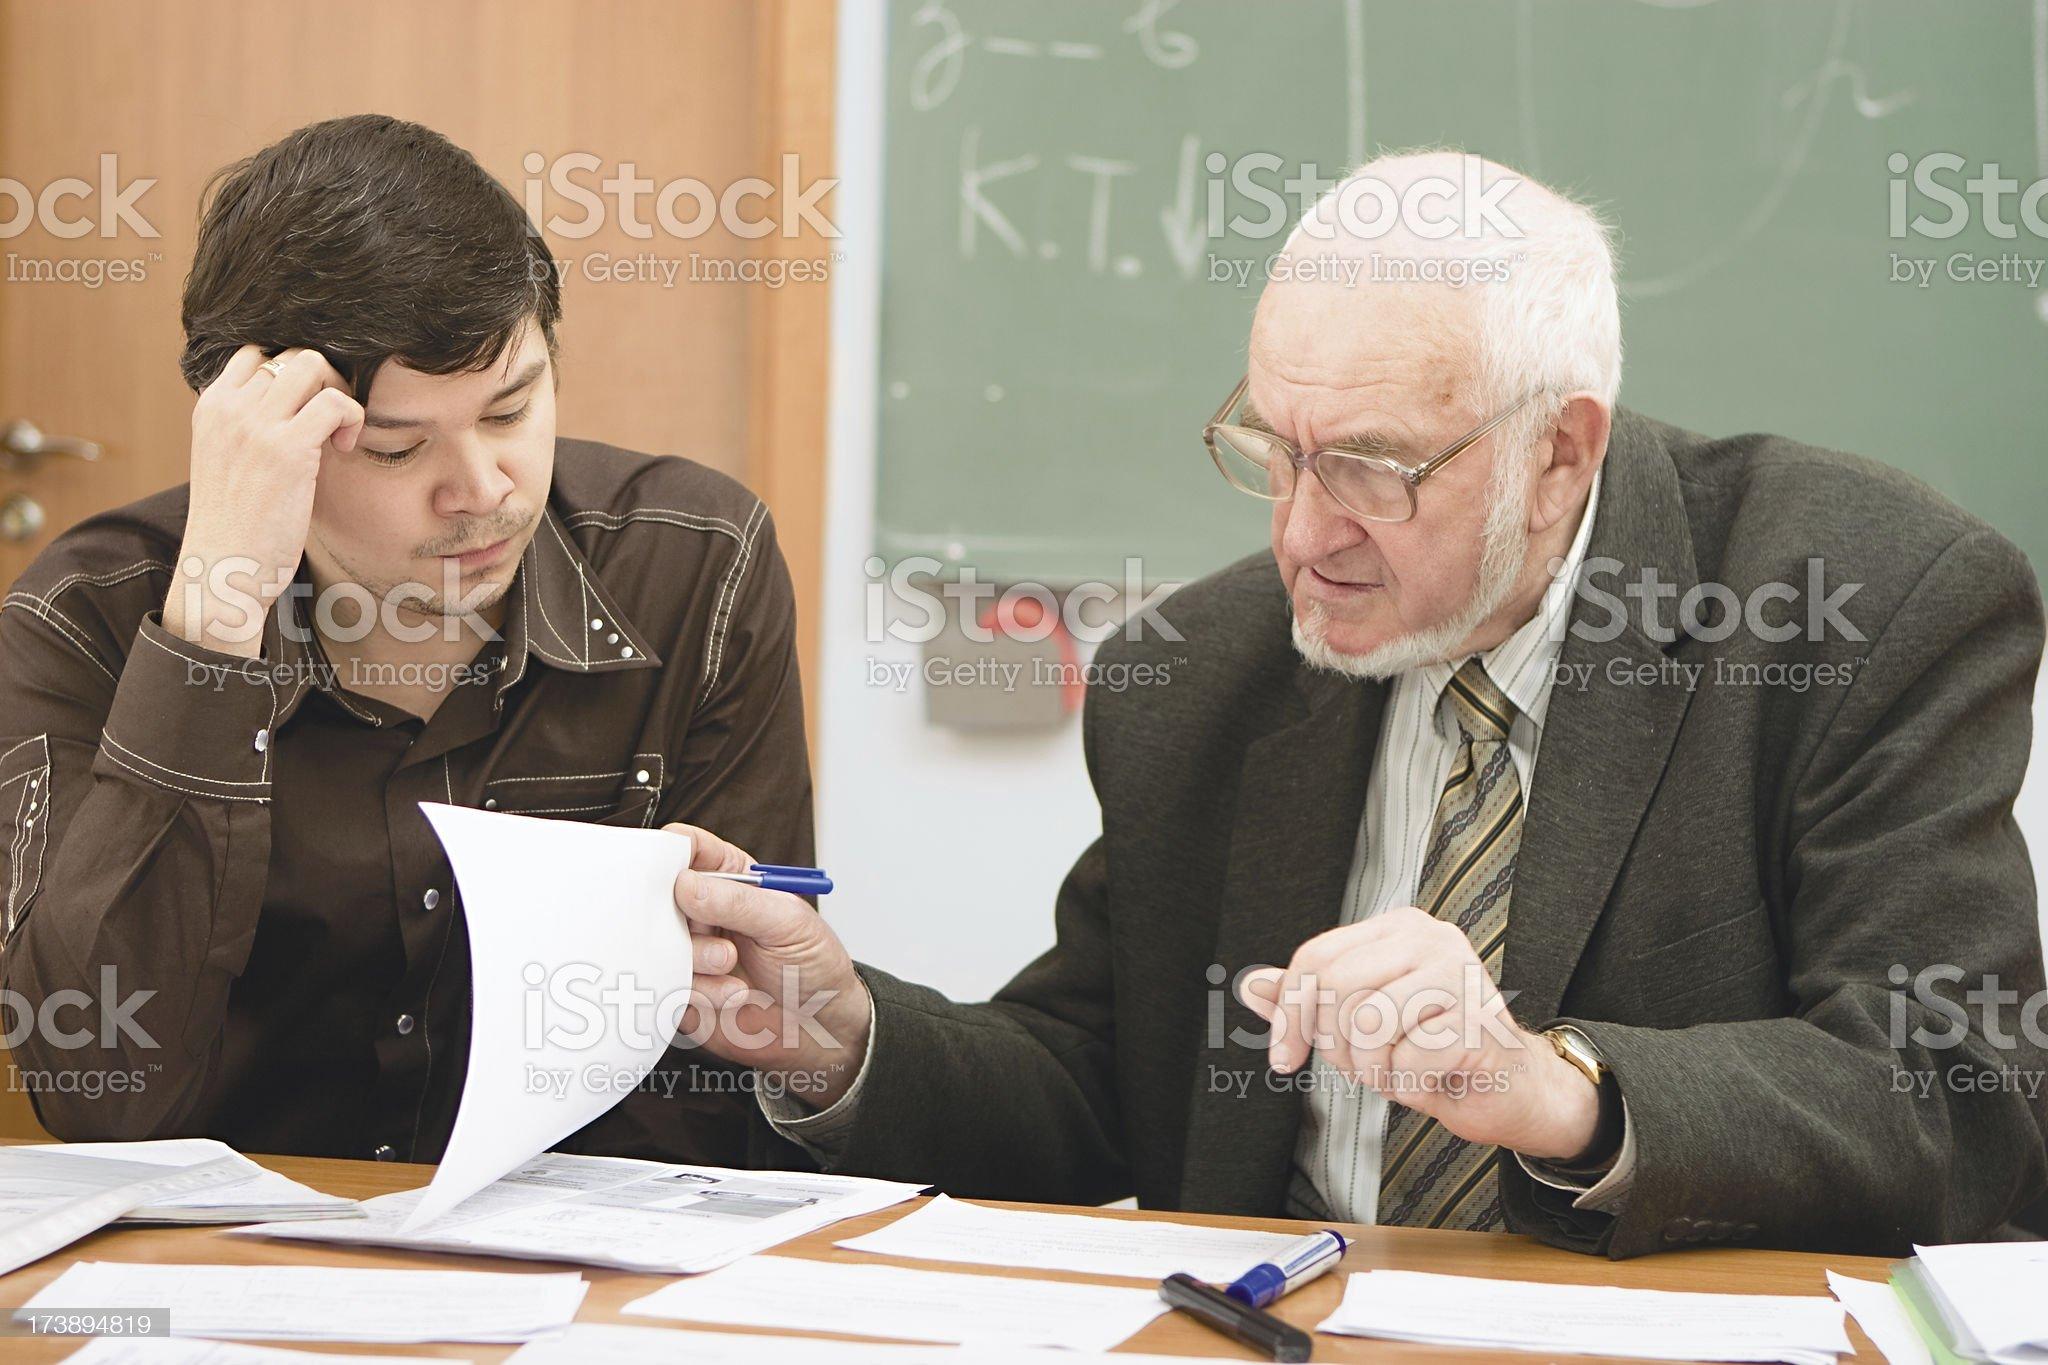 Senior professor examining the student's project royalty-free stock photo